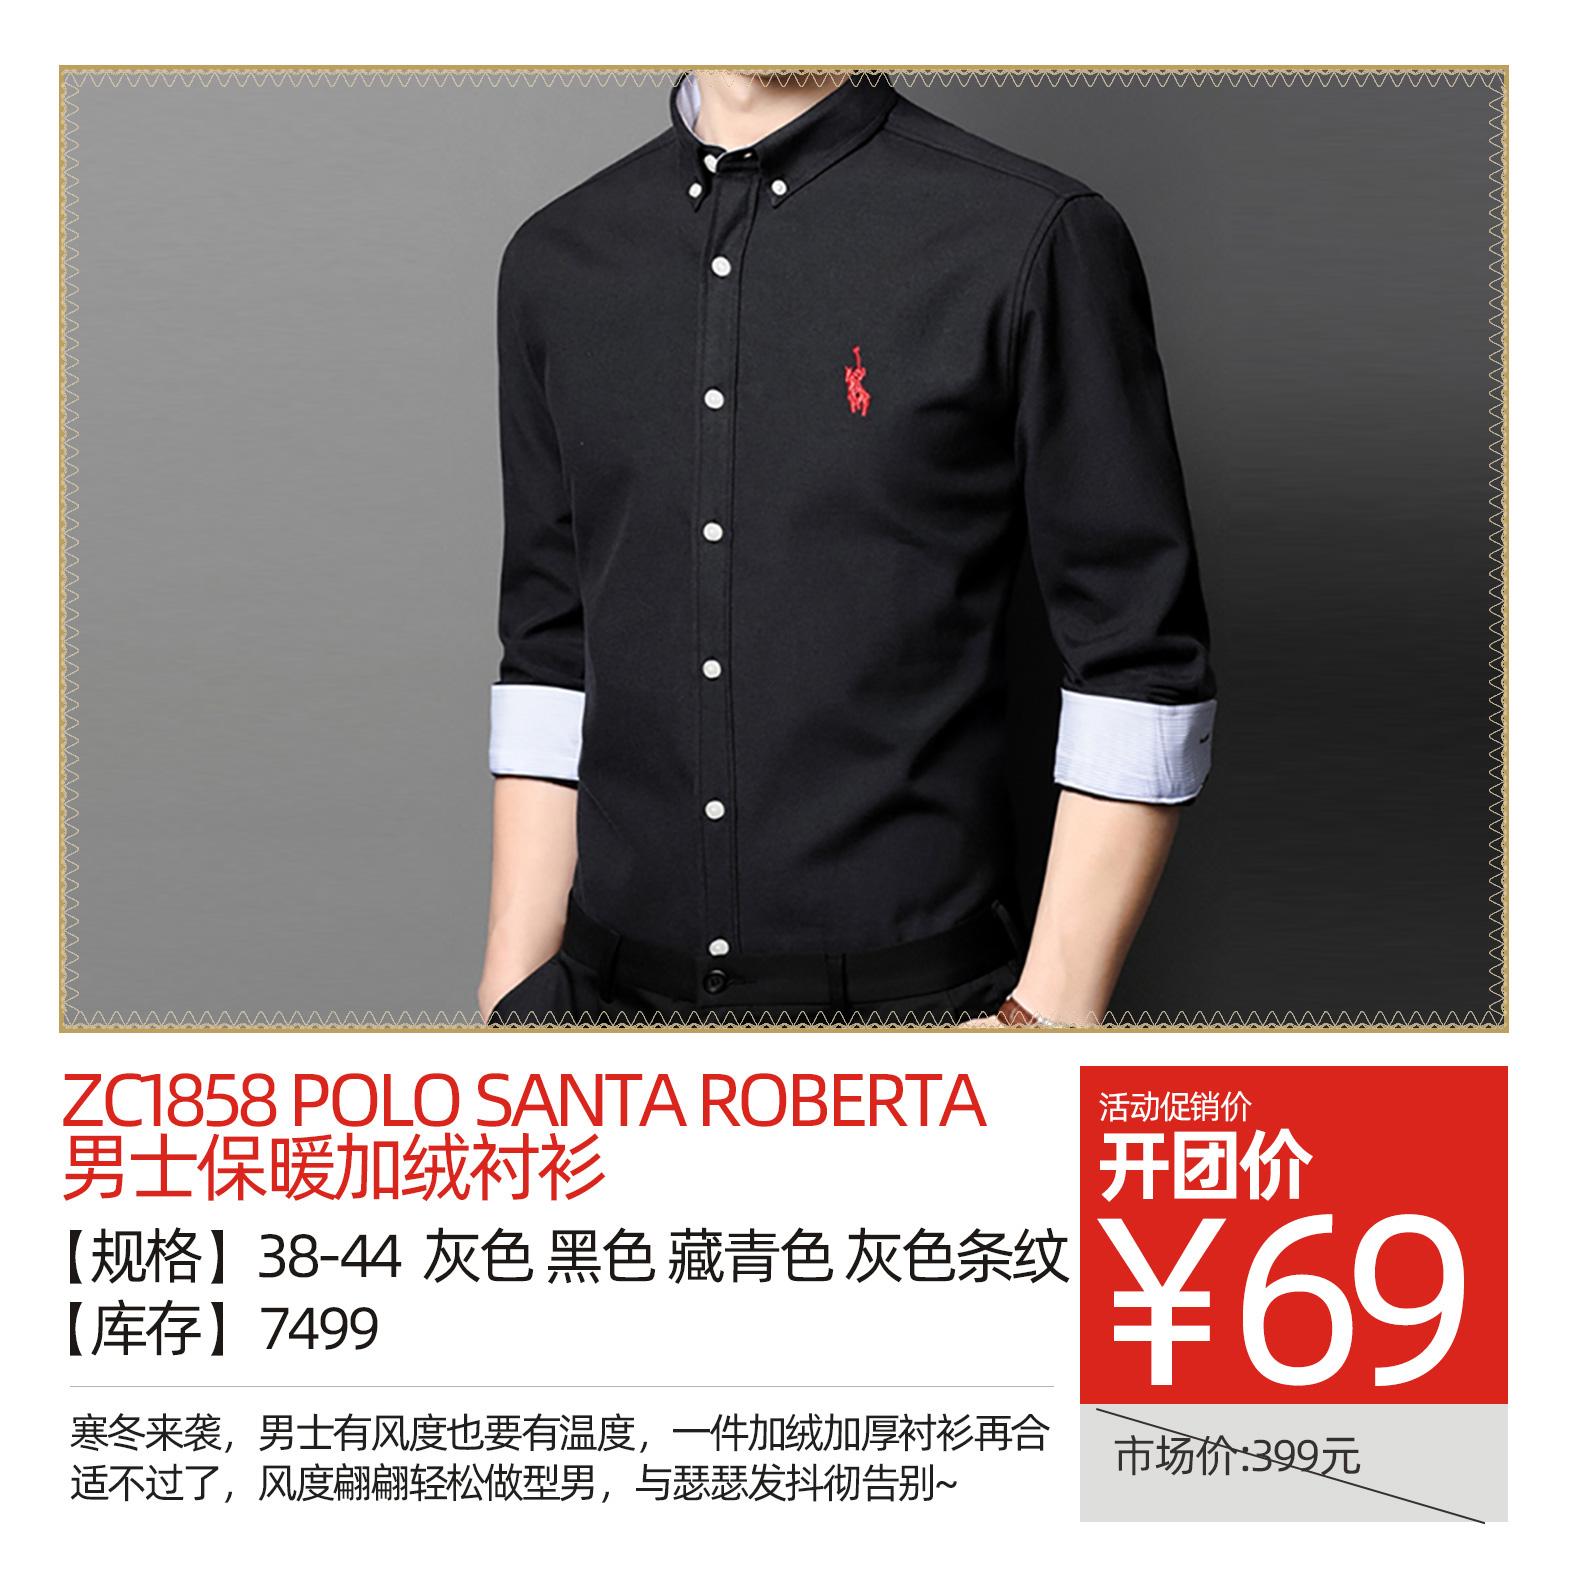 ZC1858 POLO SANTA ROBERTA 男士保暖加绒衬衫